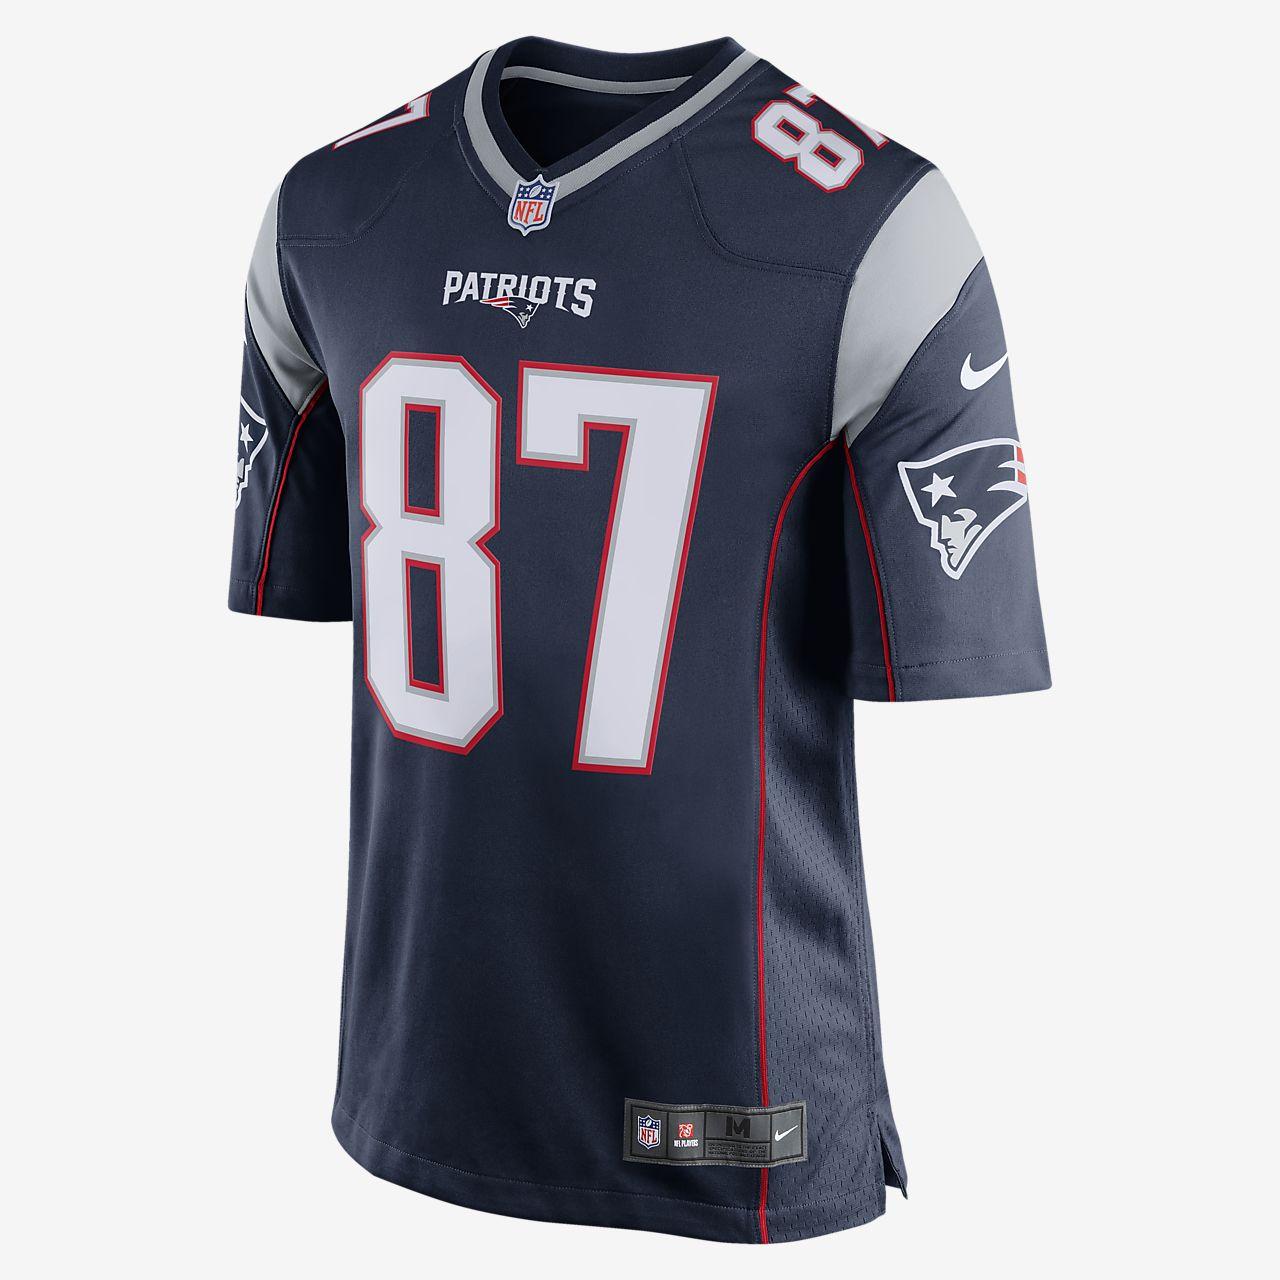 Camiseta de fútbol americano para hombre NFL New England Patriots (Rob  Gronkowski) c361f8eac71